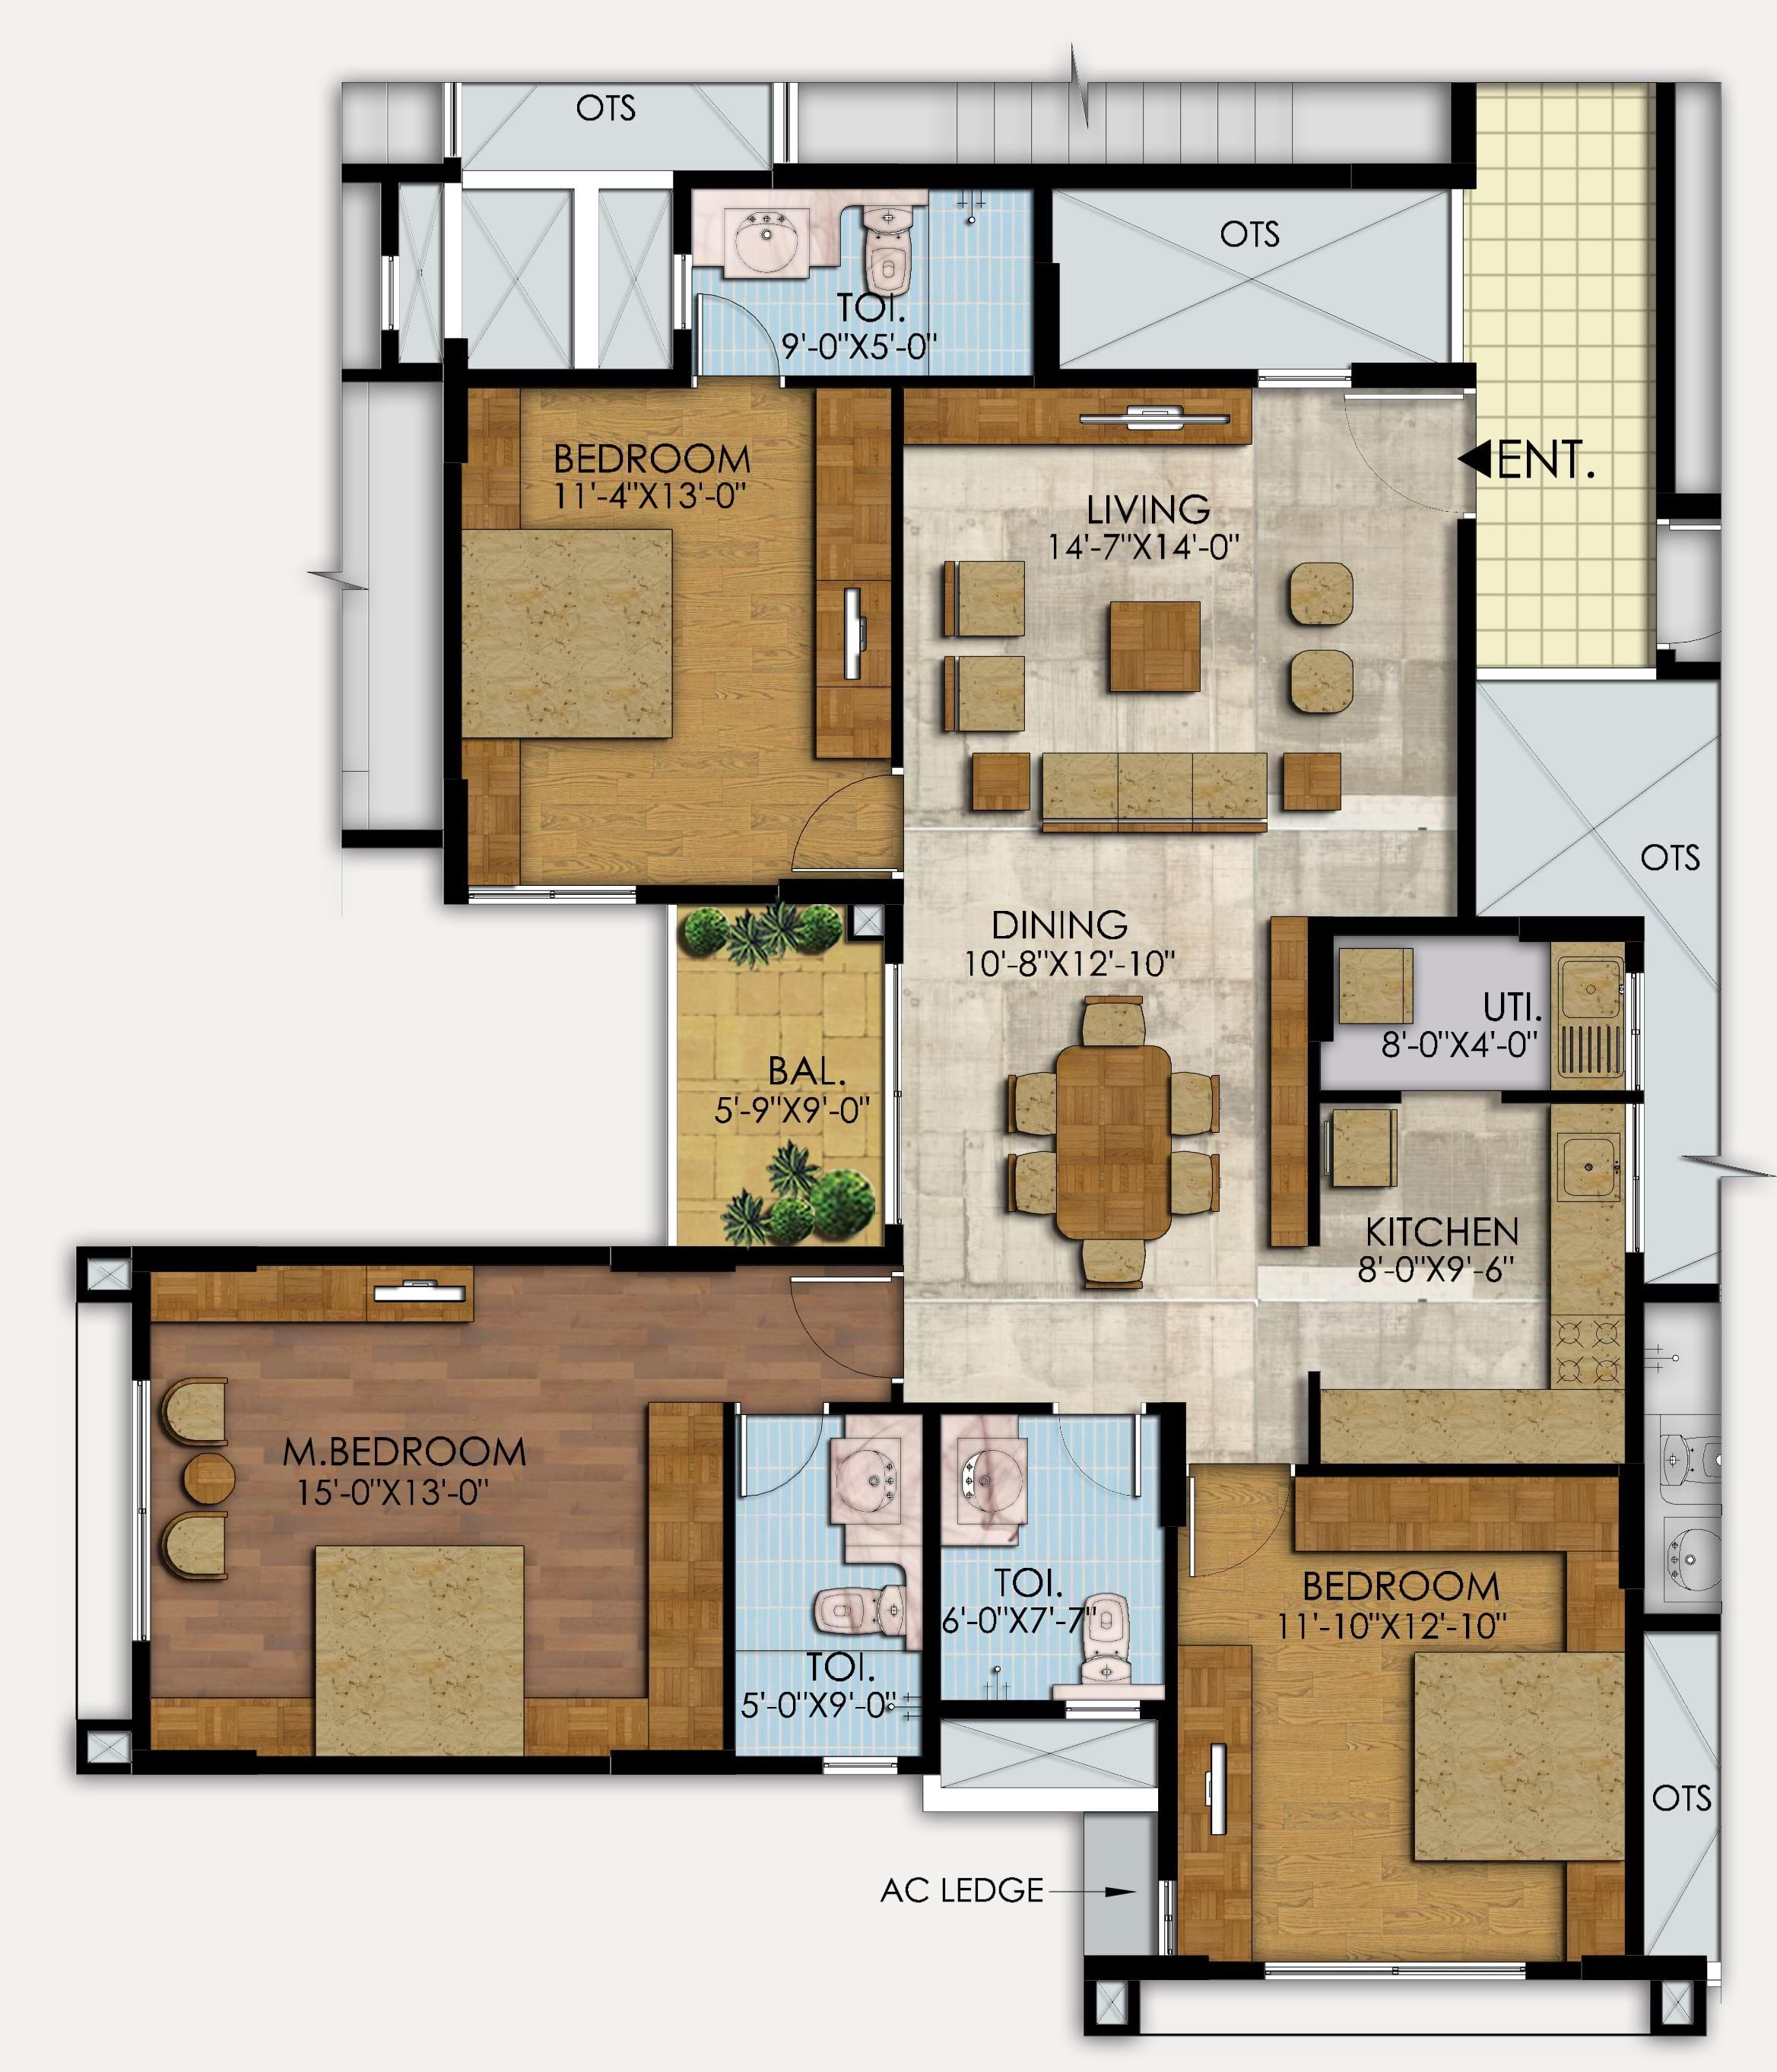 Mahaveer-Ranches-3bhk-1562-sqft-floorplan